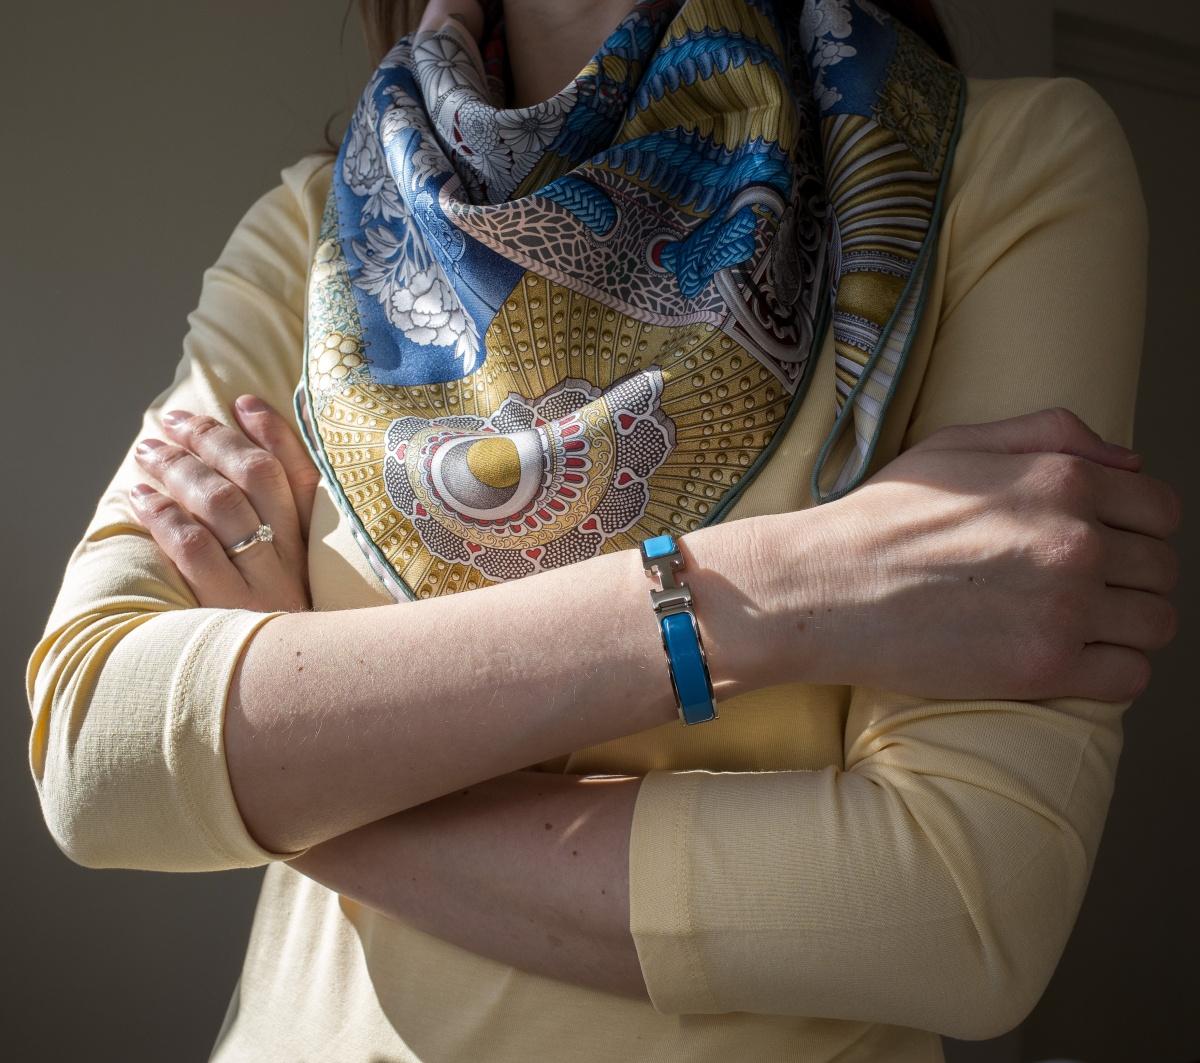 Parures de Samouiras, Aline Honore, Hermes scarf, carre, knot, knotting, tutorial, hermes carre, Hermes Schal, эрмес, платок, карре, как красиво завязать платок, how to wear a scarf, Clic H bleu cielo, Clic H bracelet